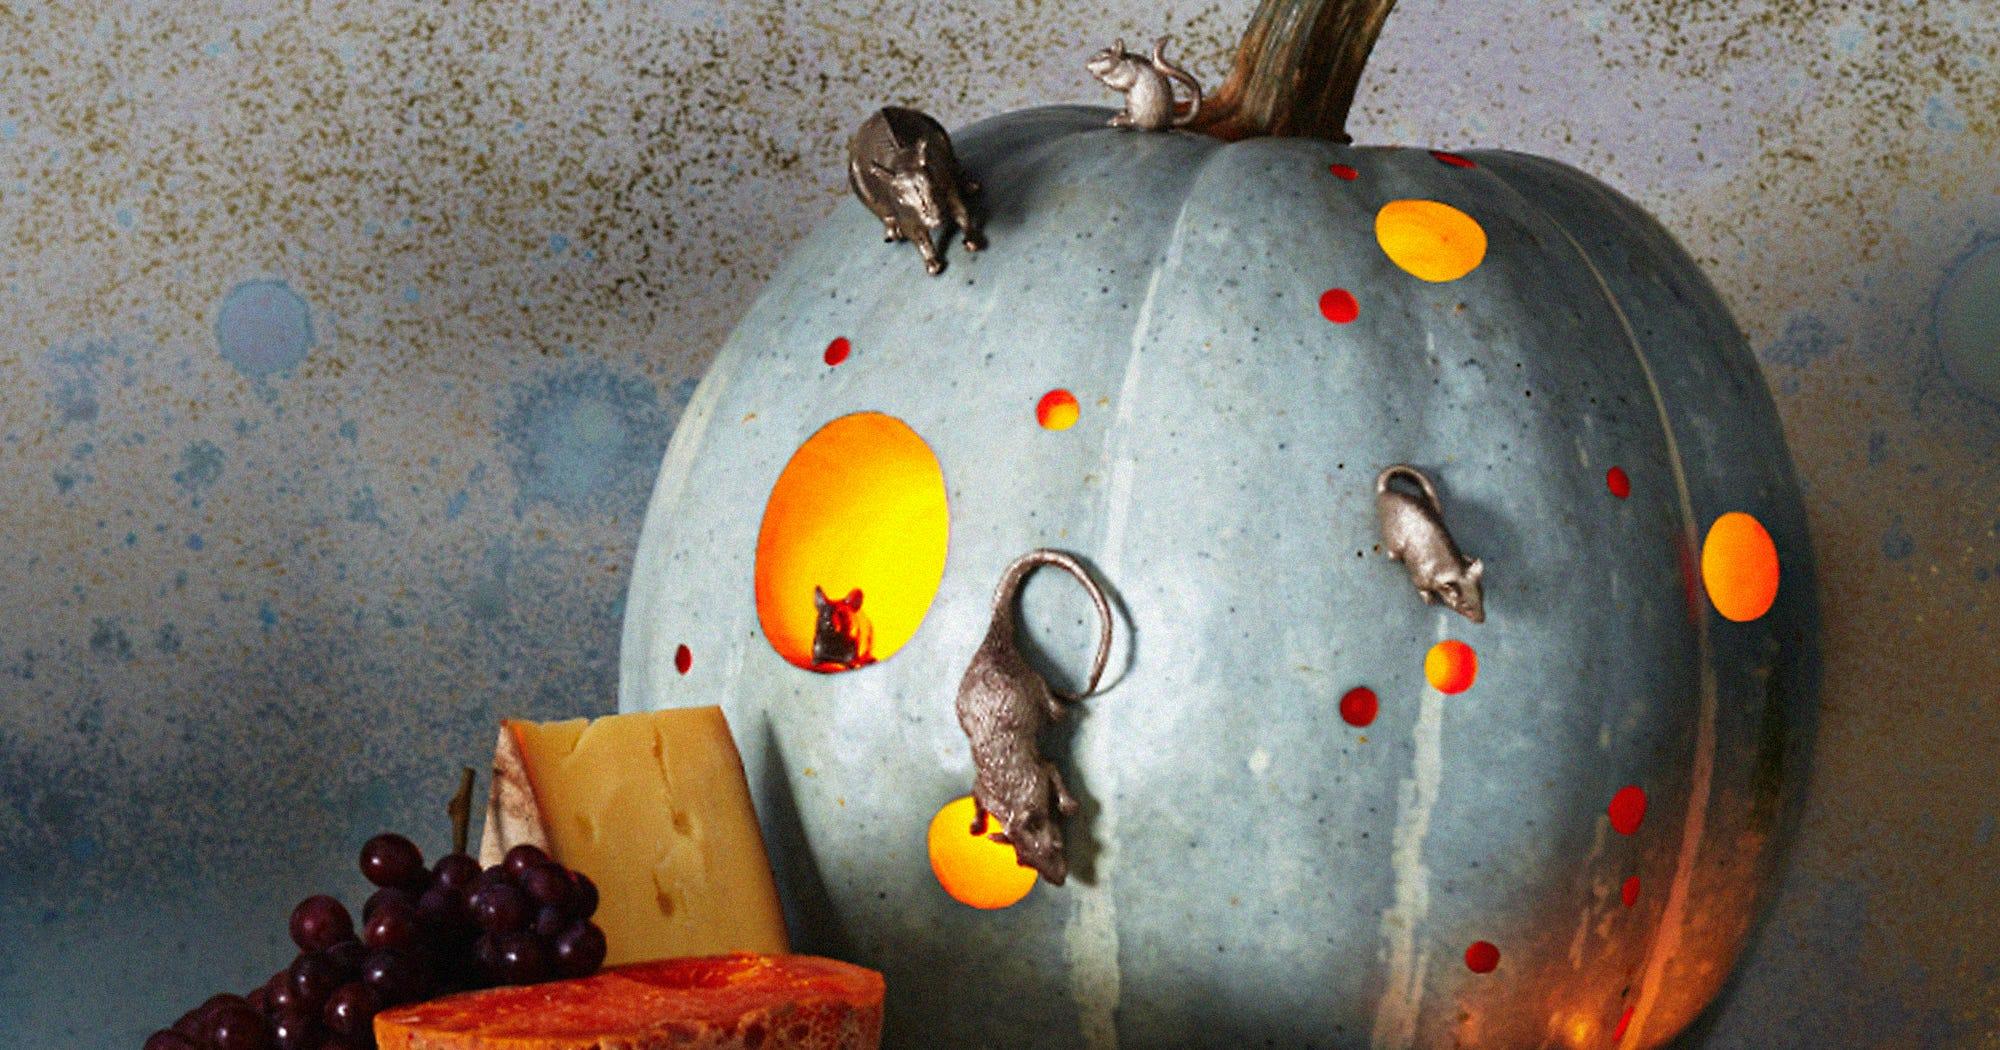 Pumpkin Carving Ideas Scary Cool Designs Halloween 2017